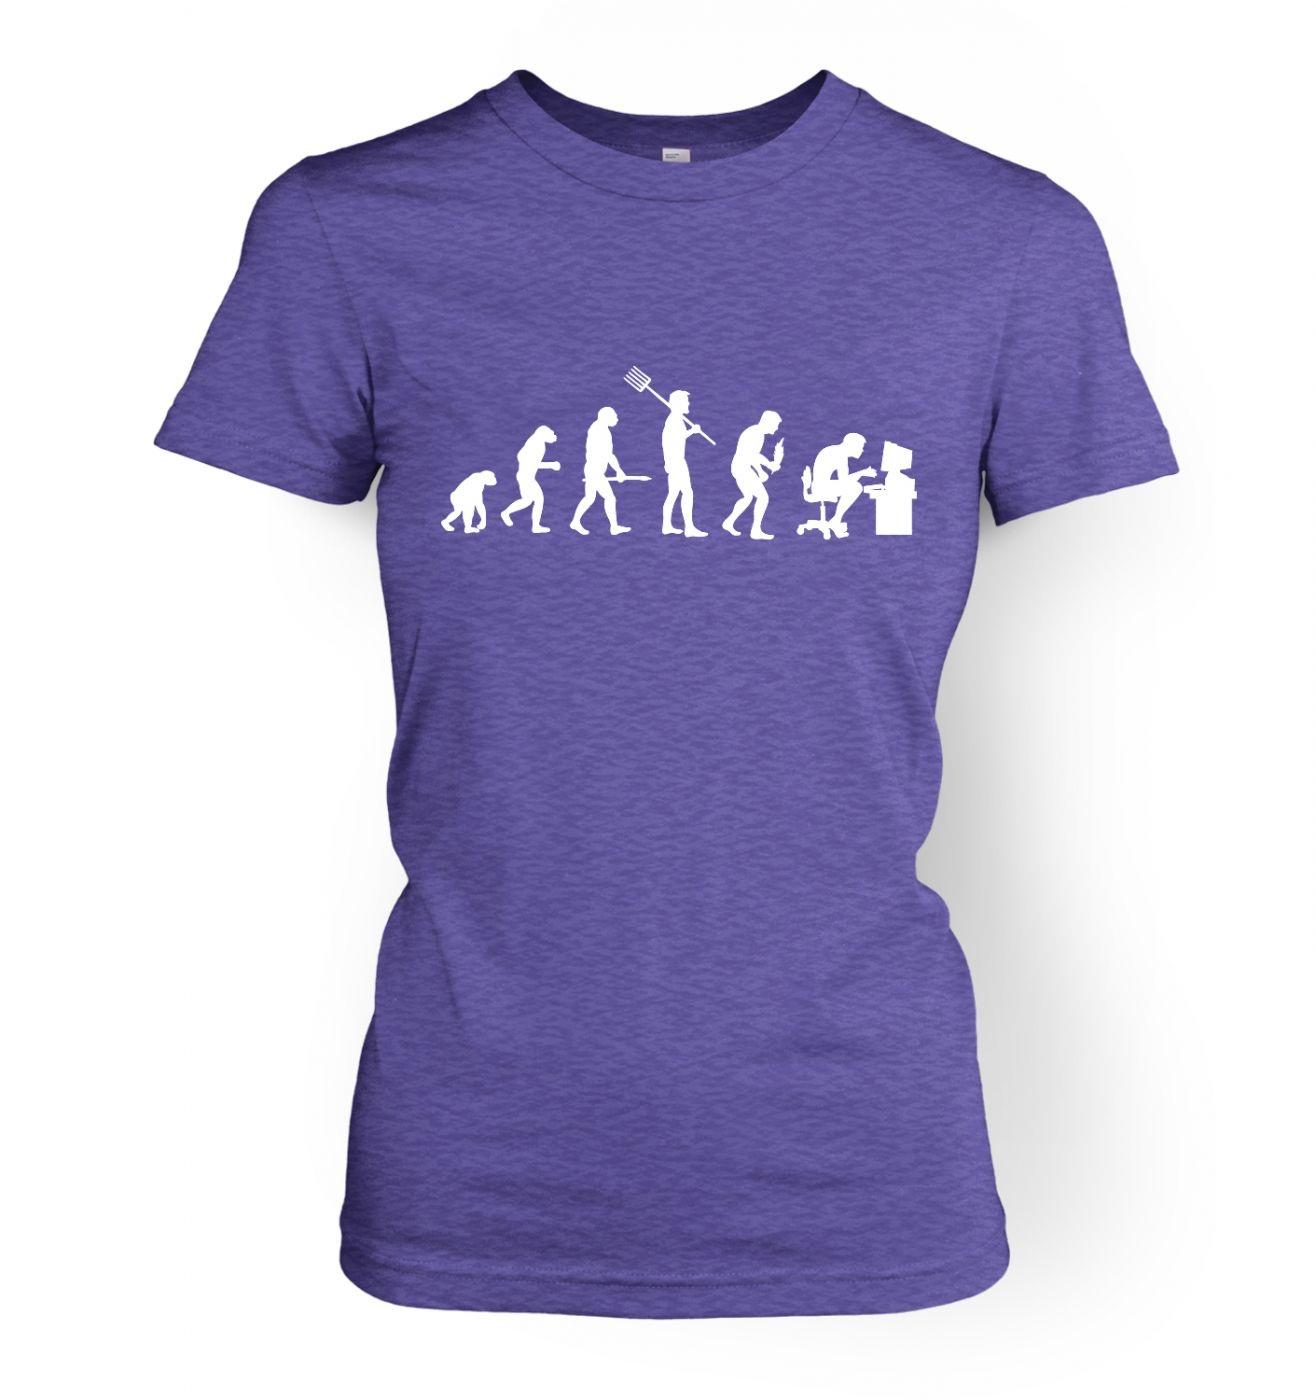 Women's Evolution of a geeky man (white detail) t-shirt